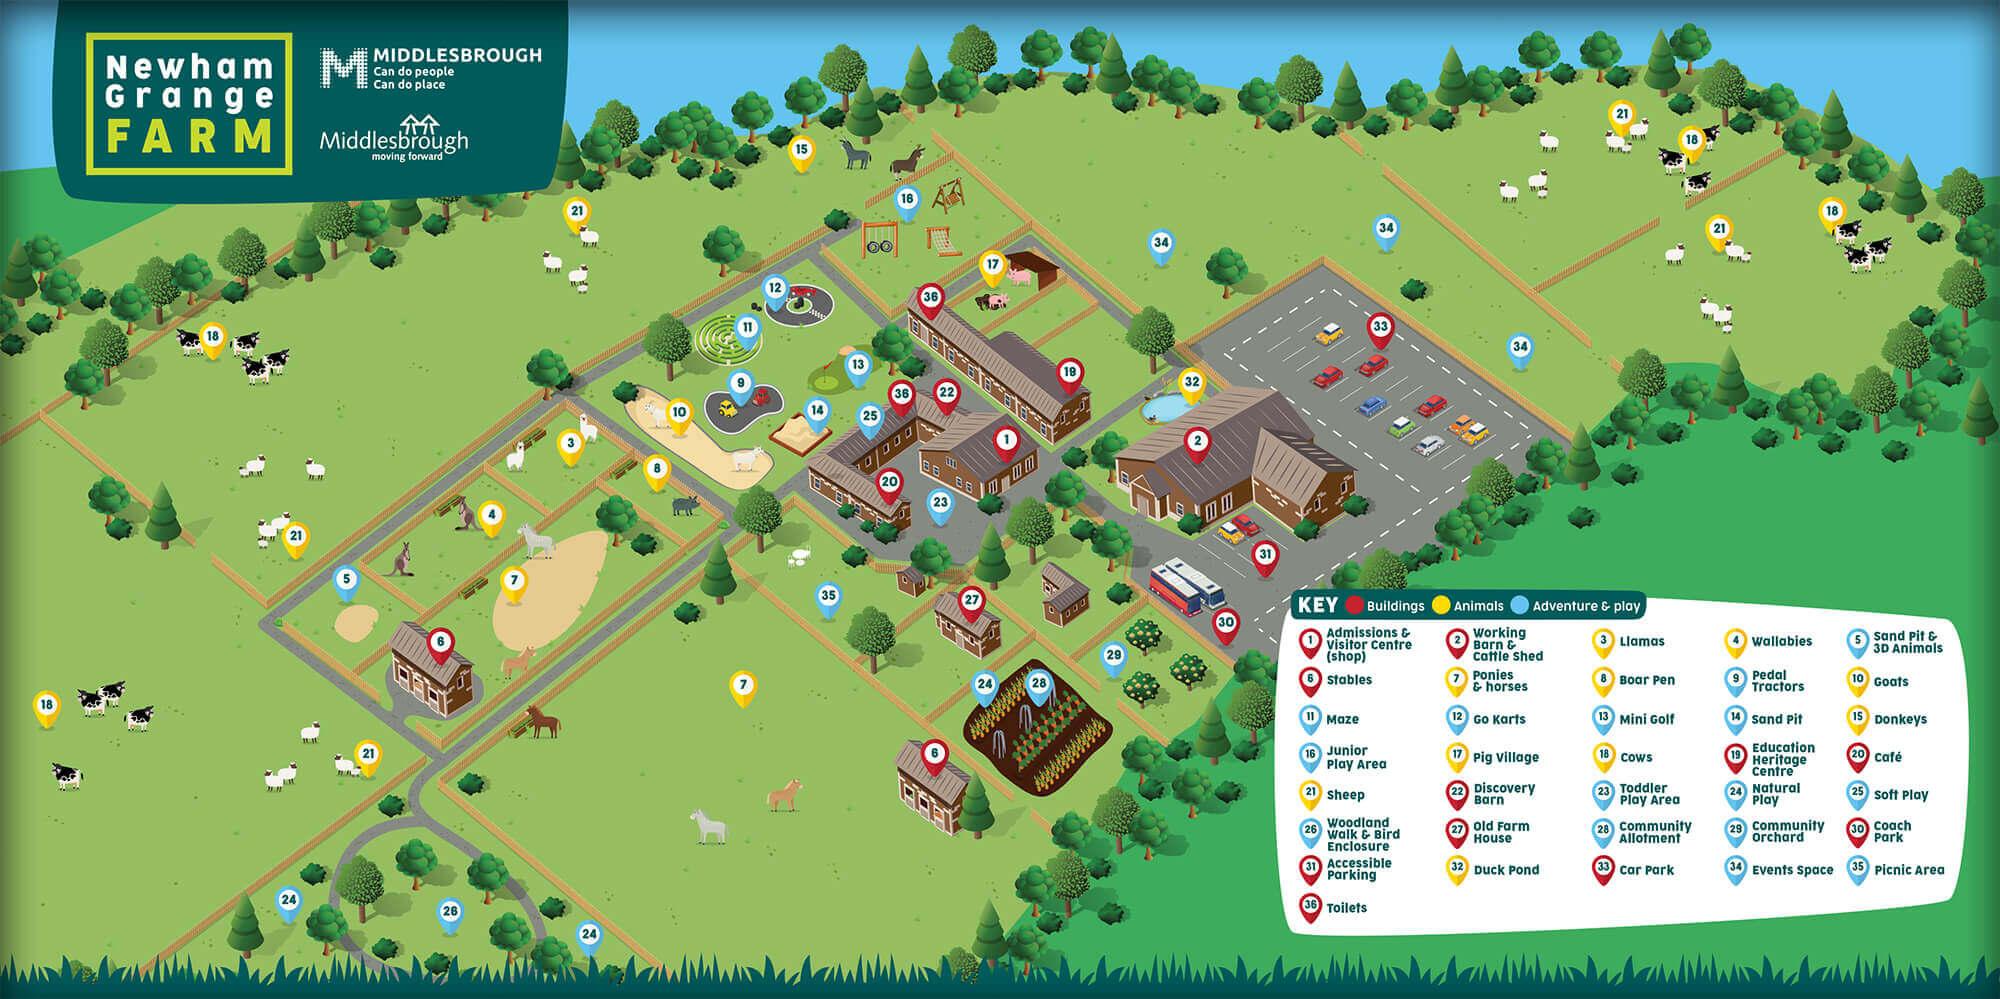 Newham Grange Farm Map